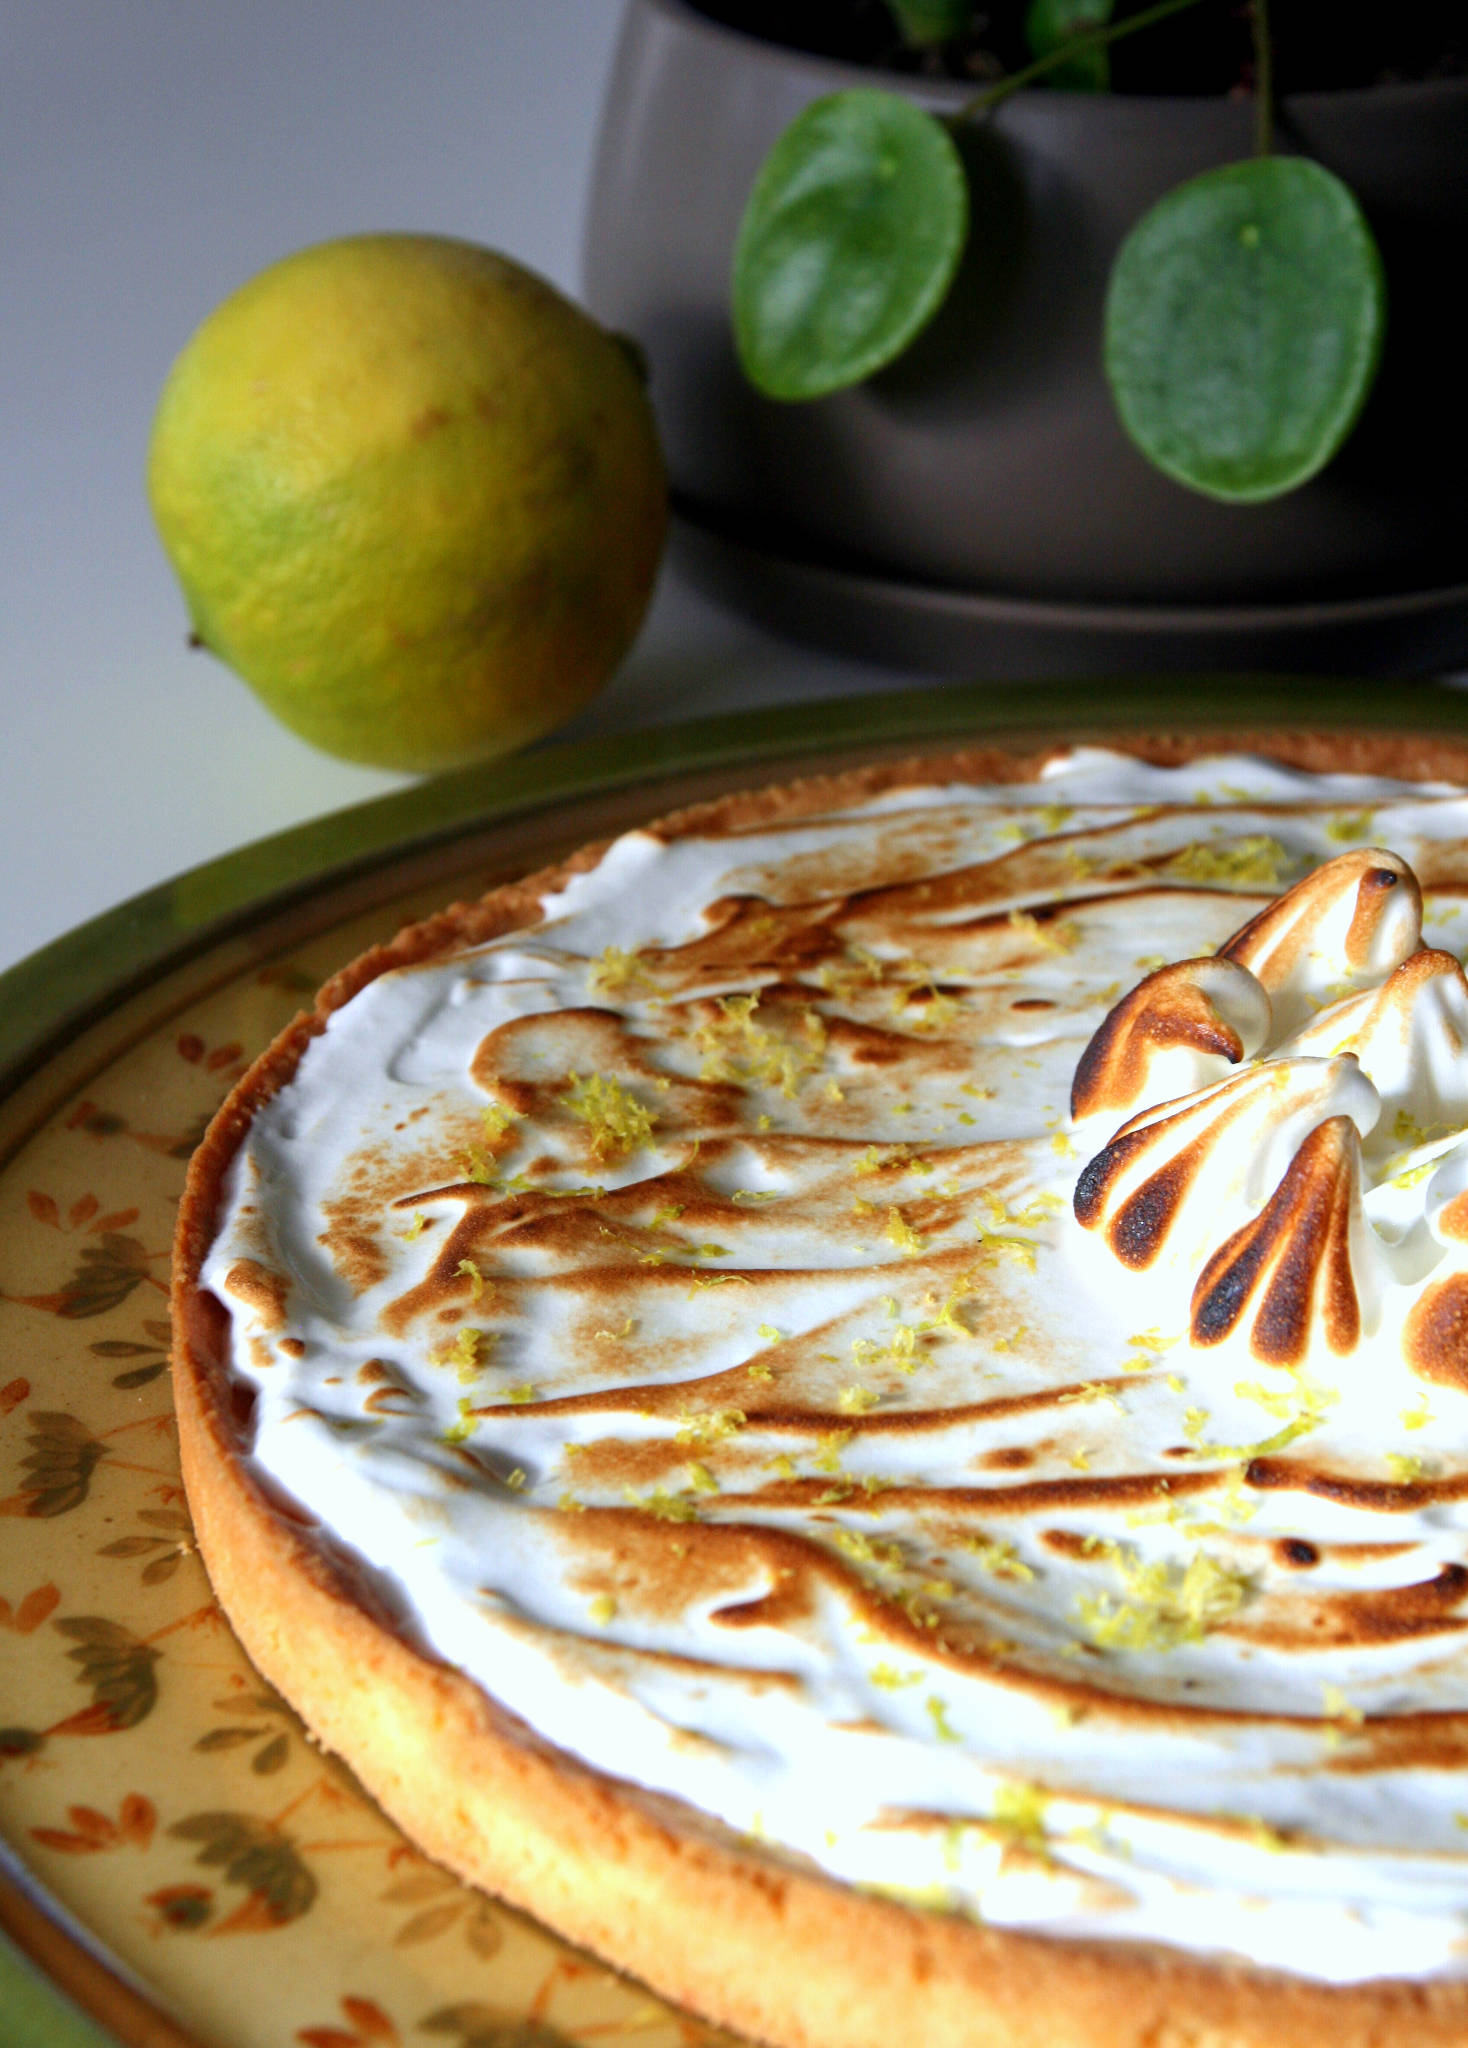 Tarte meringuée au citron bergamote